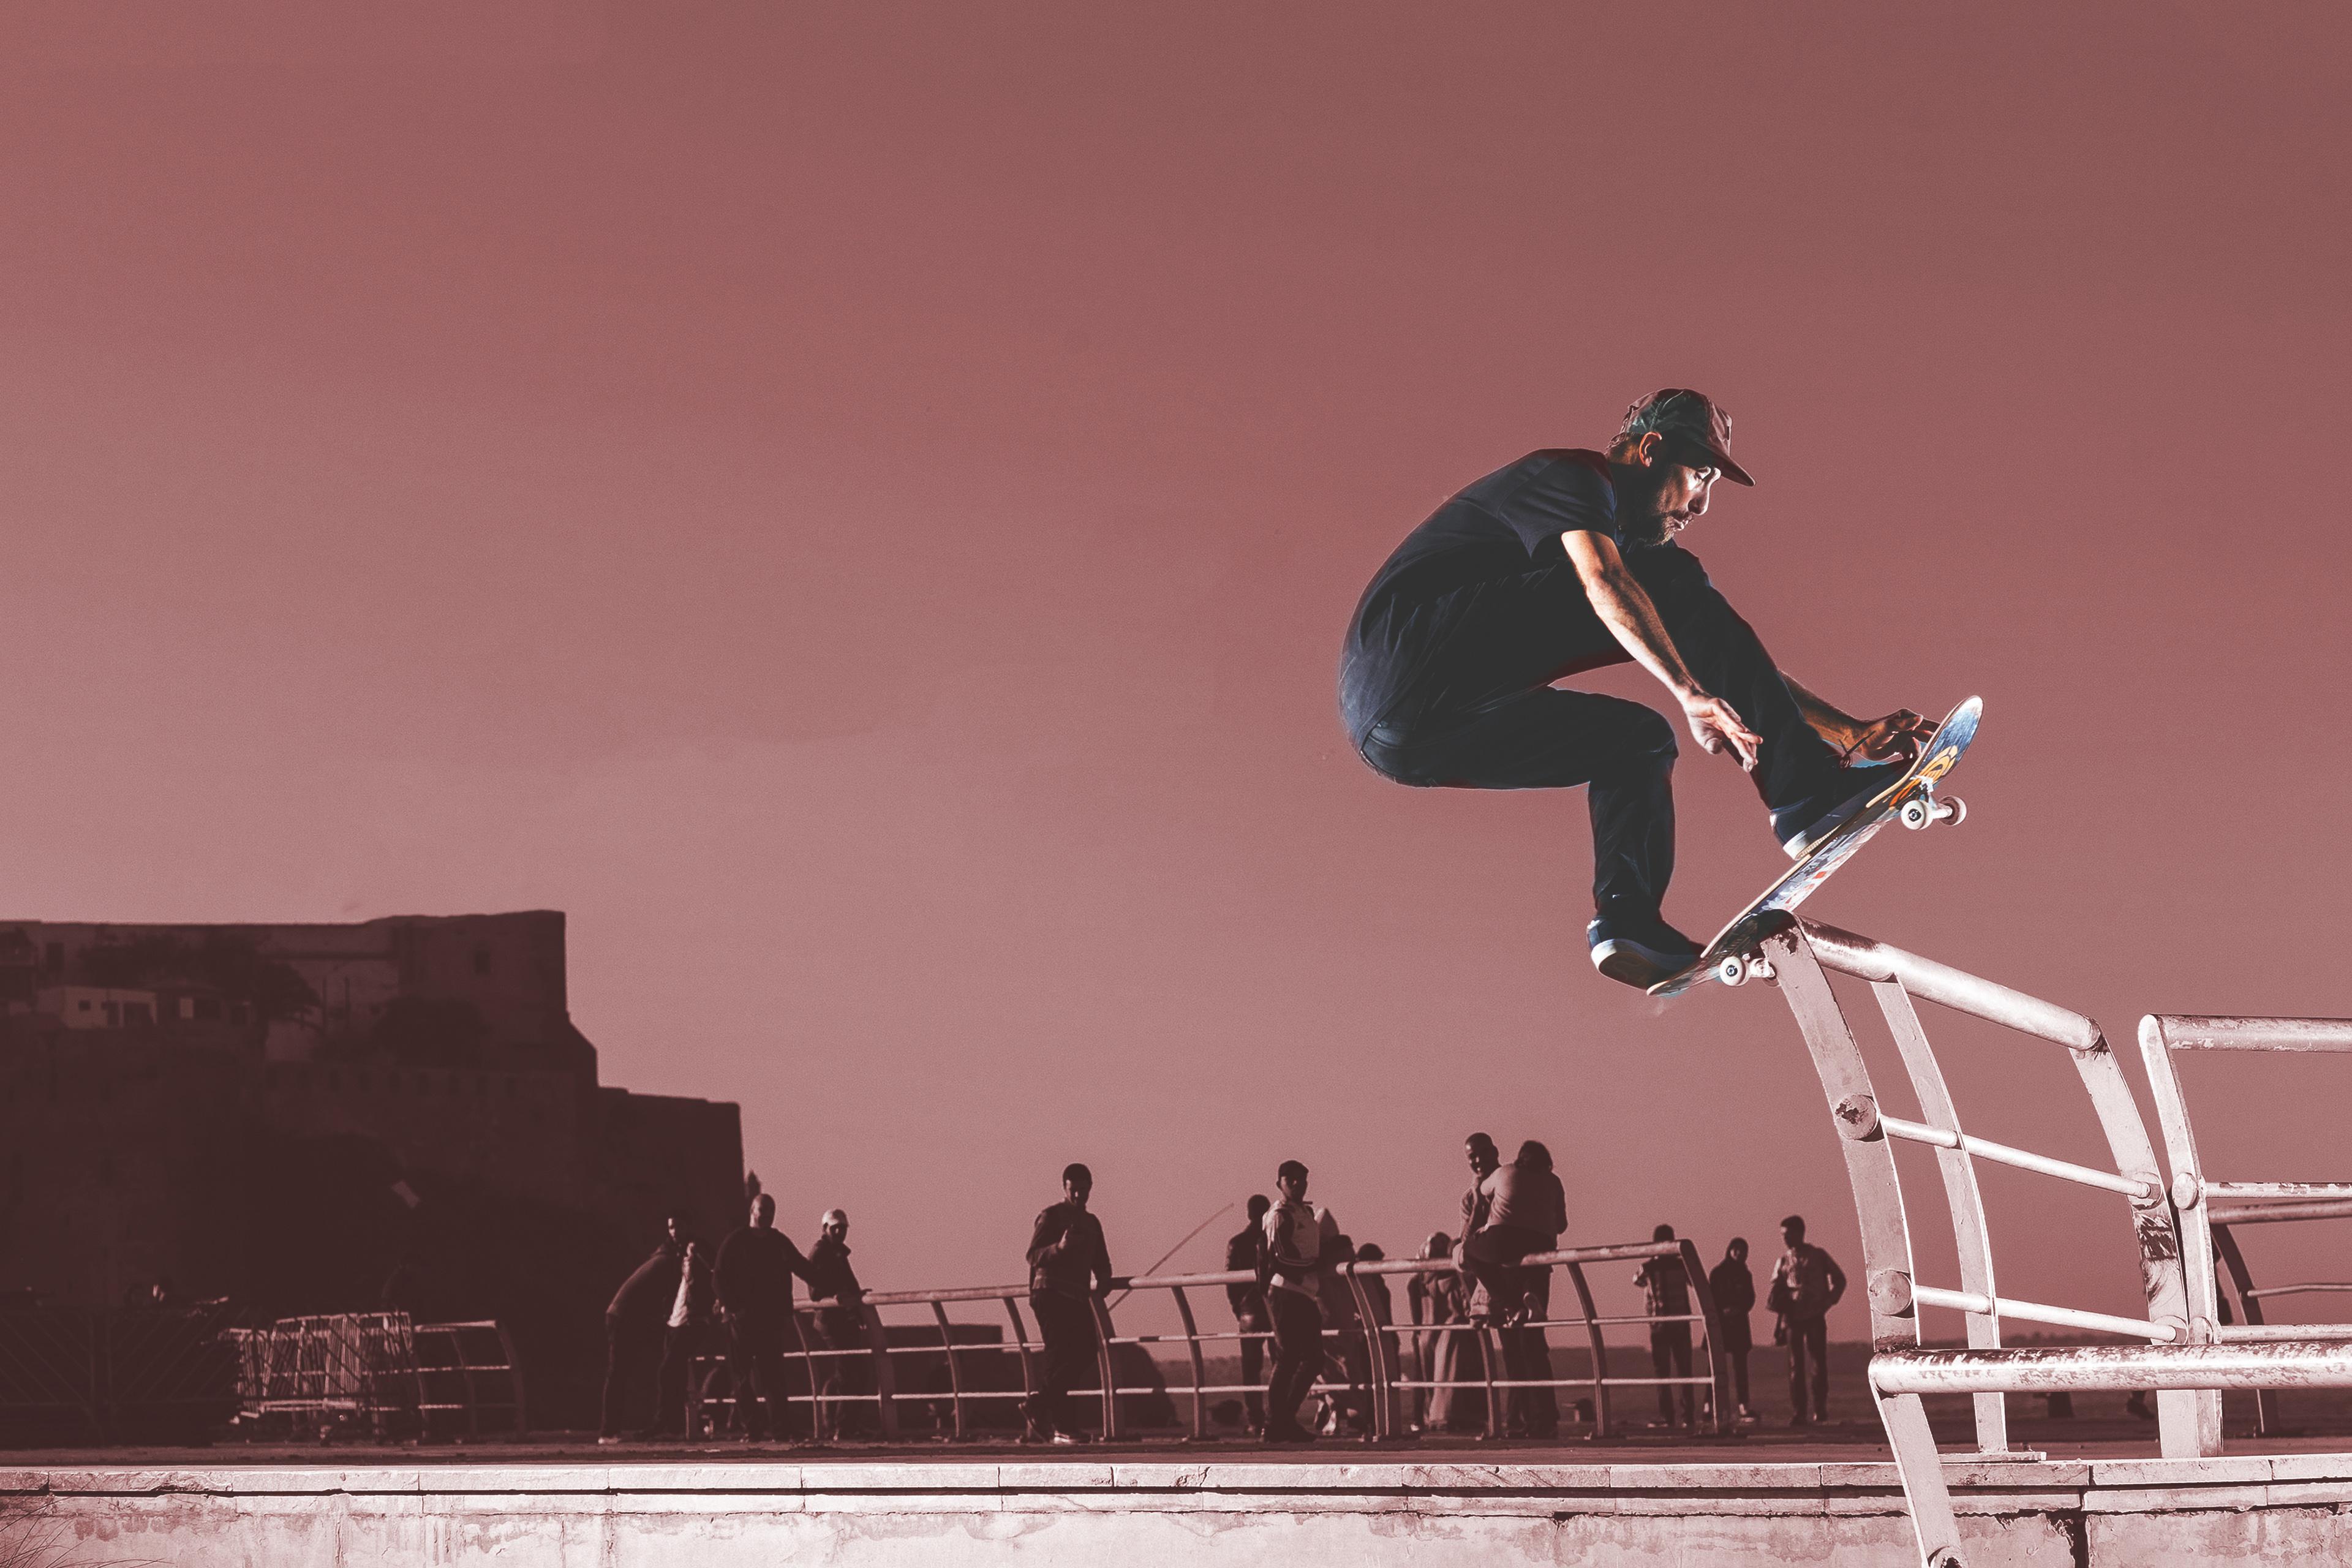 1920x1080 Skateboard Stunting Man 4k Laptop Full HD 1080P ...